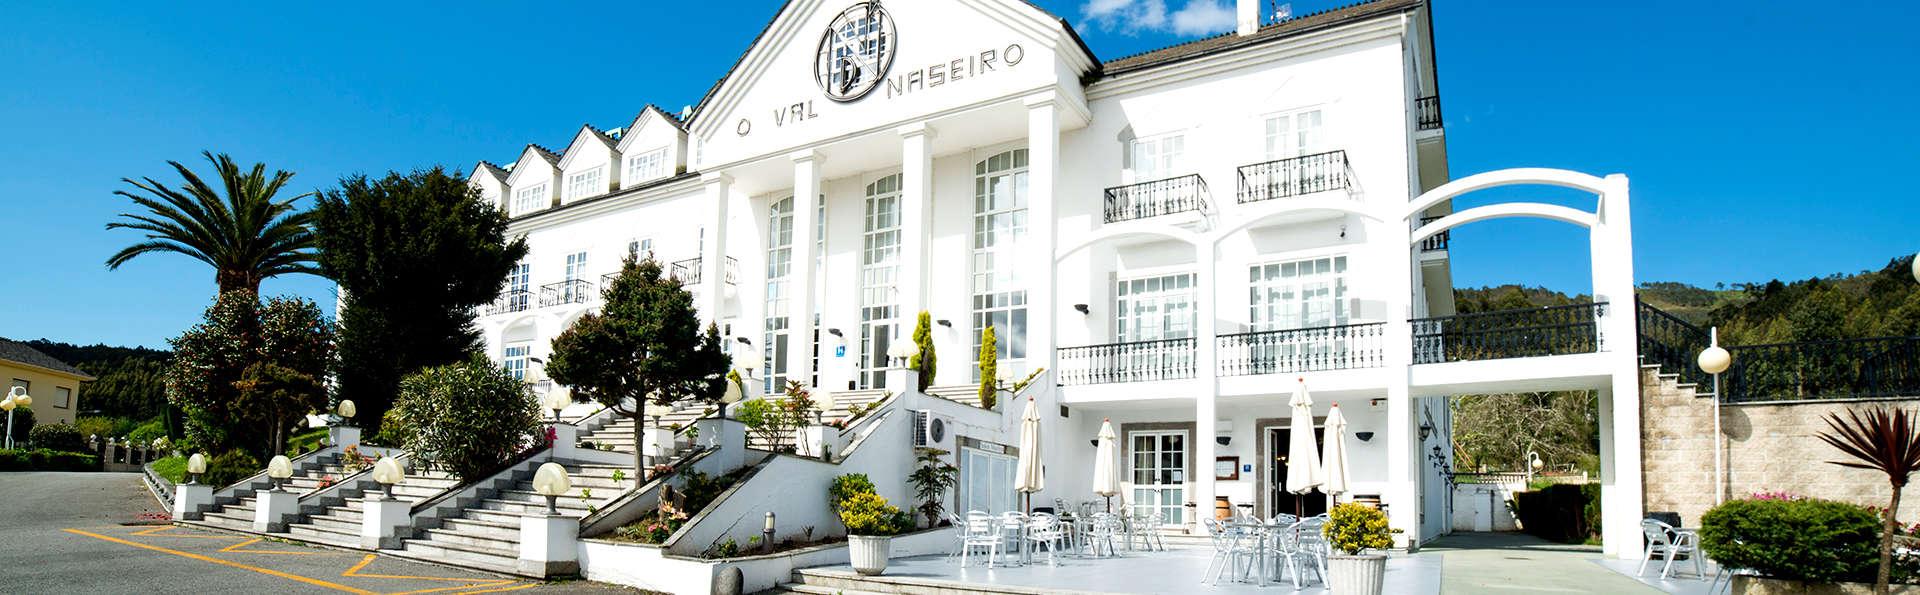 Escapada Romántica con Cena en habitación deluxe con vistas al valle de Viveiro